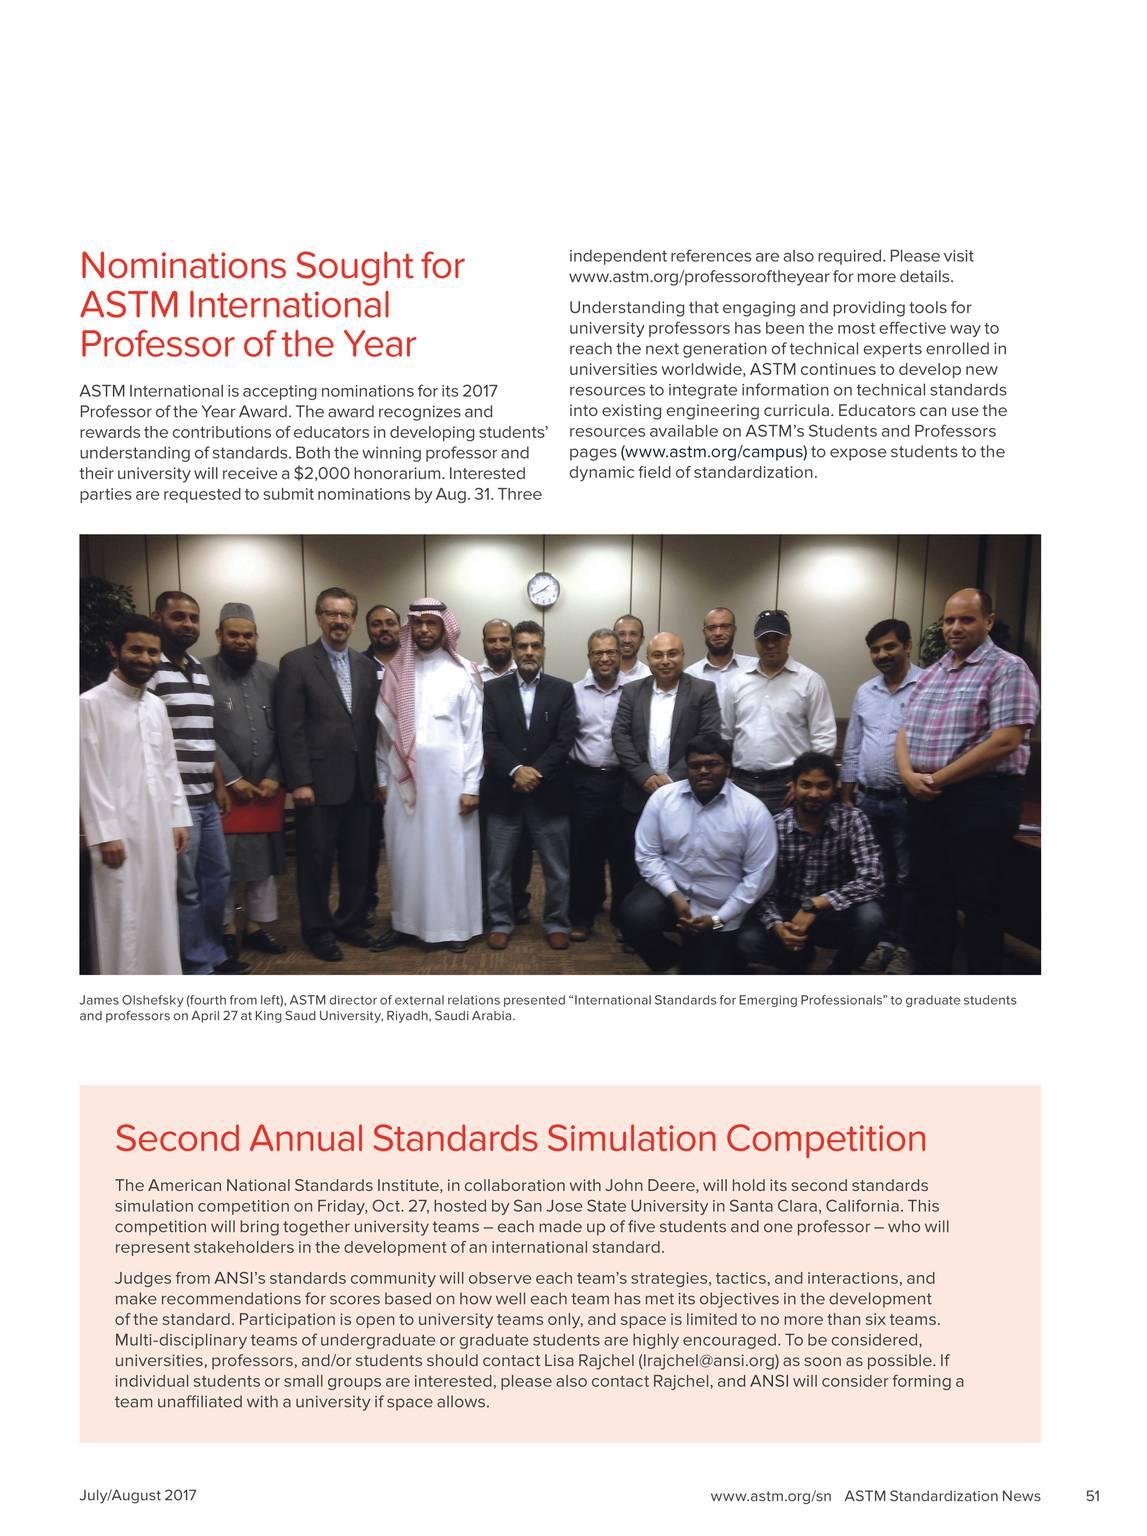 Standardization News - July / August 2017 - page 50